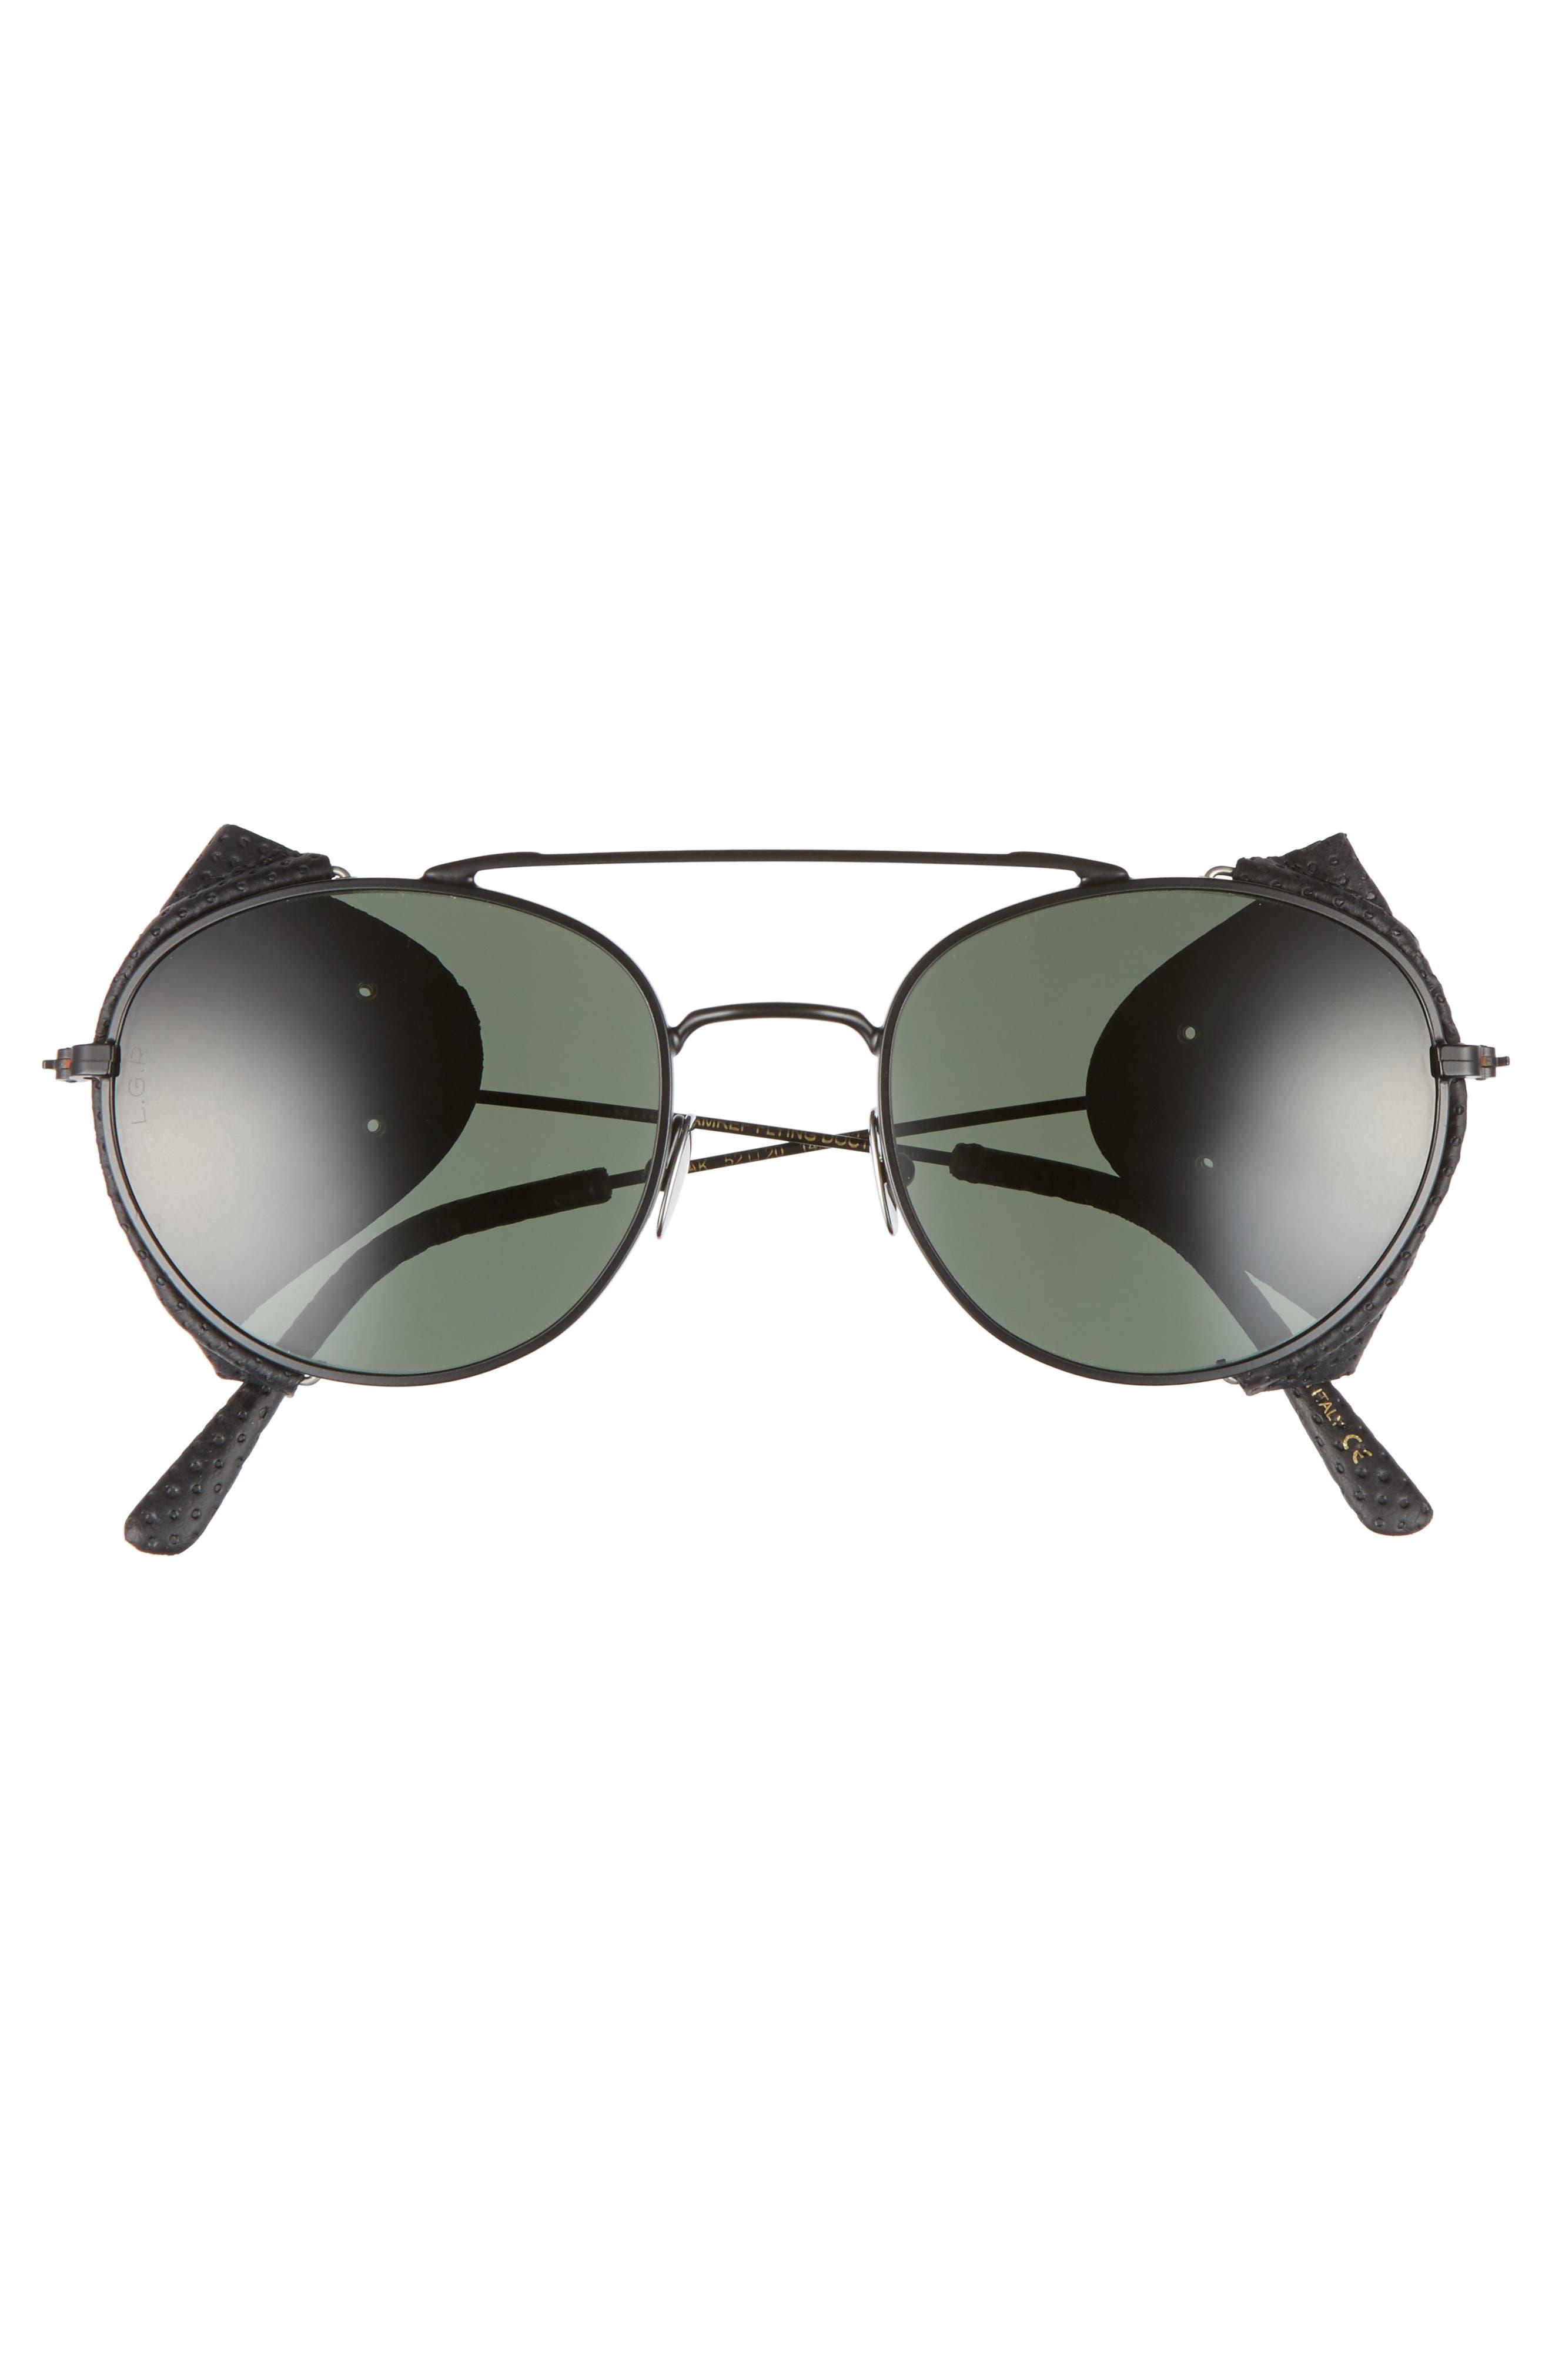 Amref 52mm Sunglasses,                             Alternate thumbnail 2, color,                             001